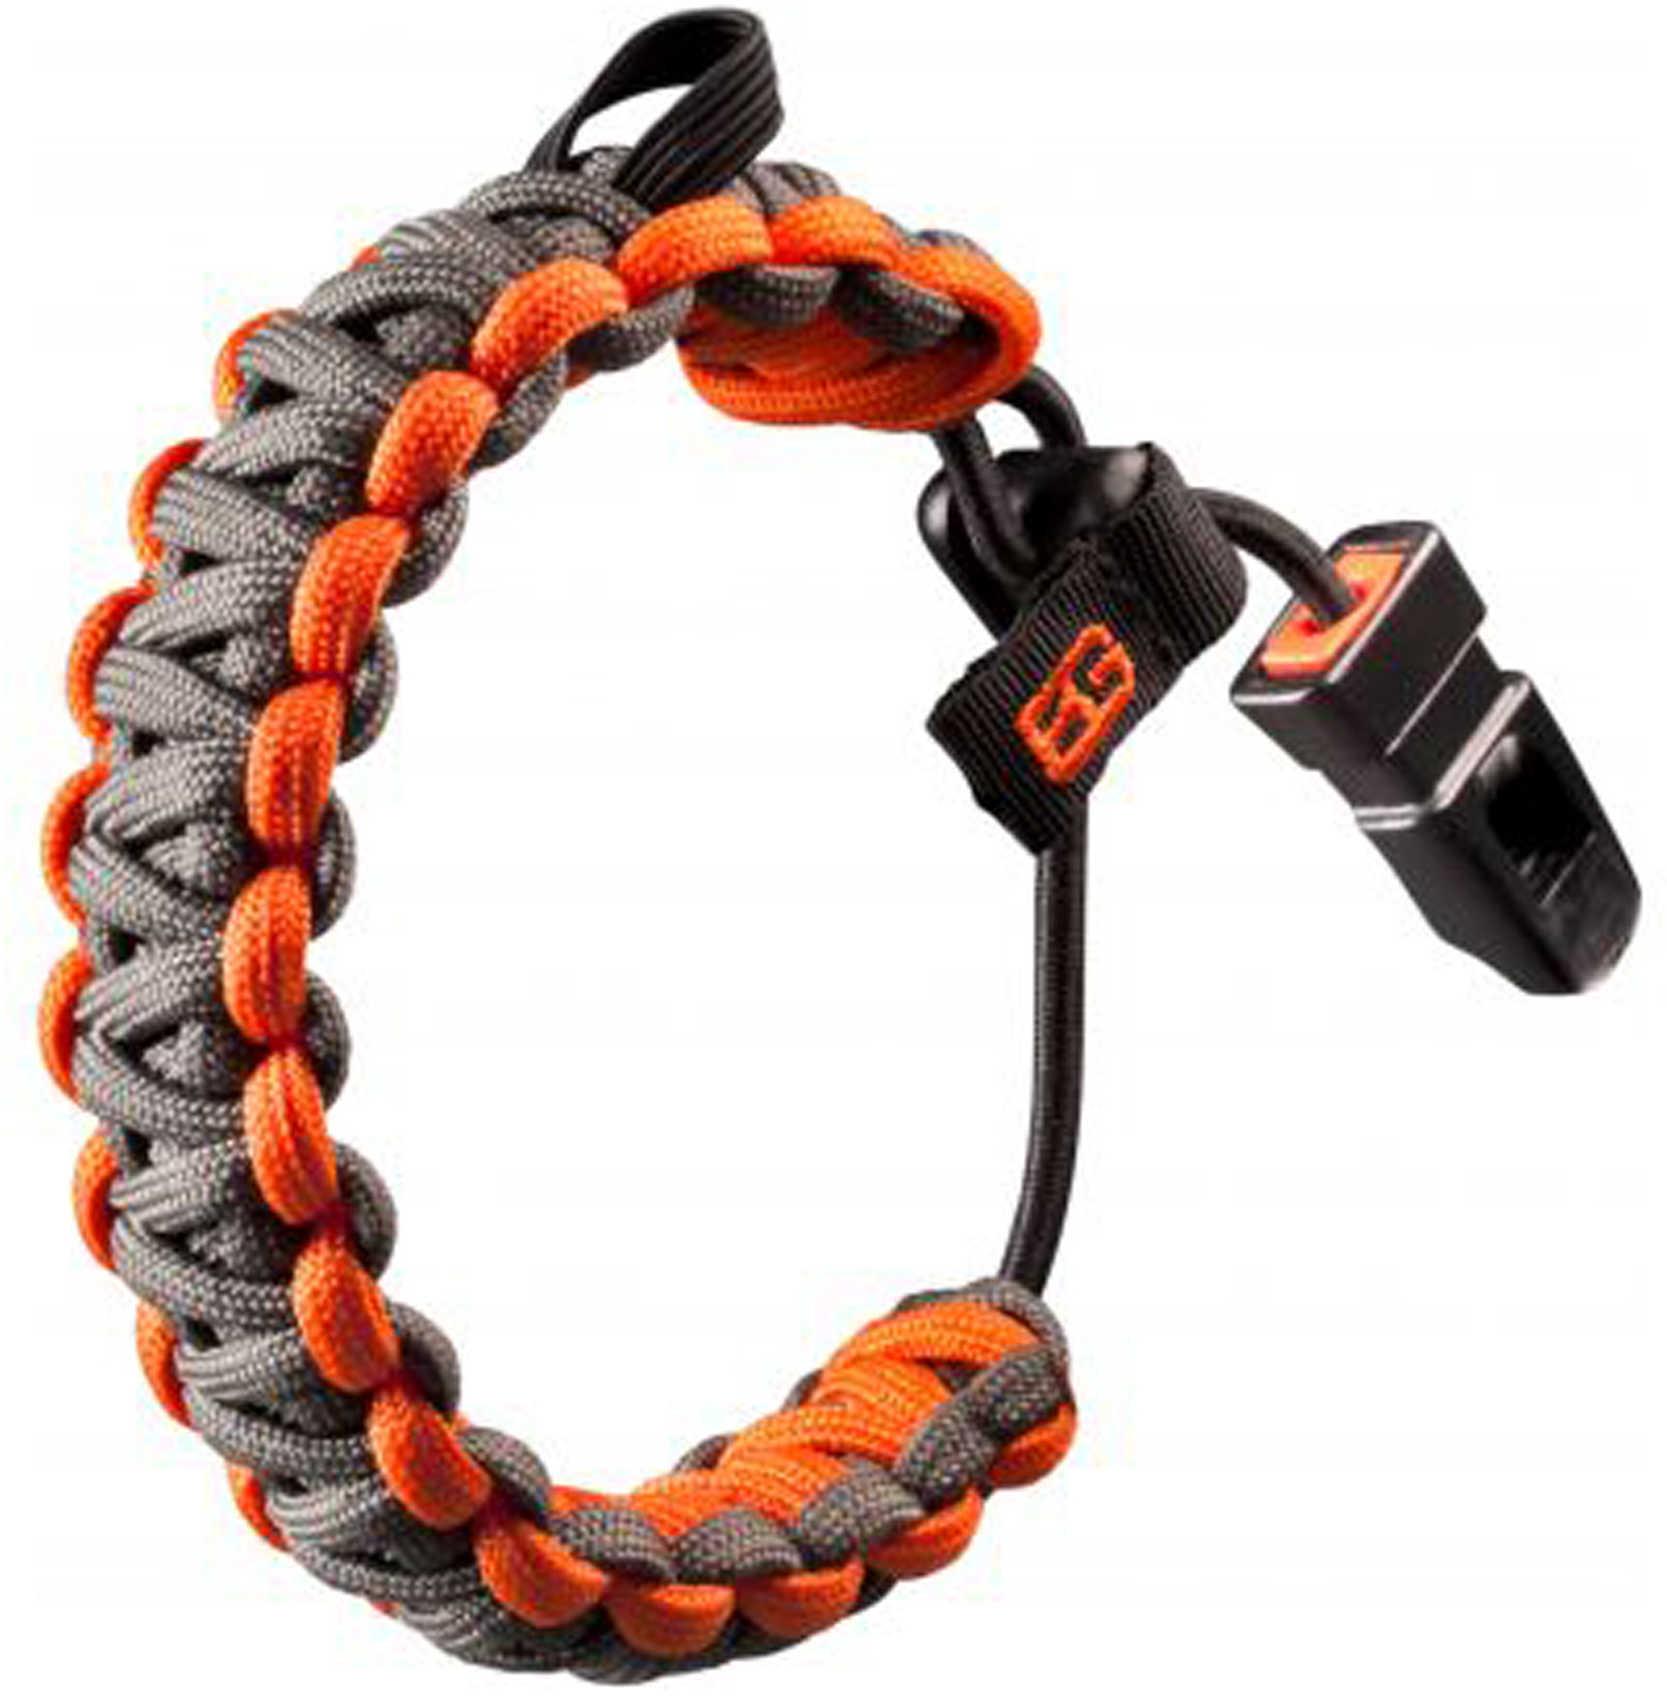 Gerber Bear Grylls Series Survival Bracelet Md: 31-001773